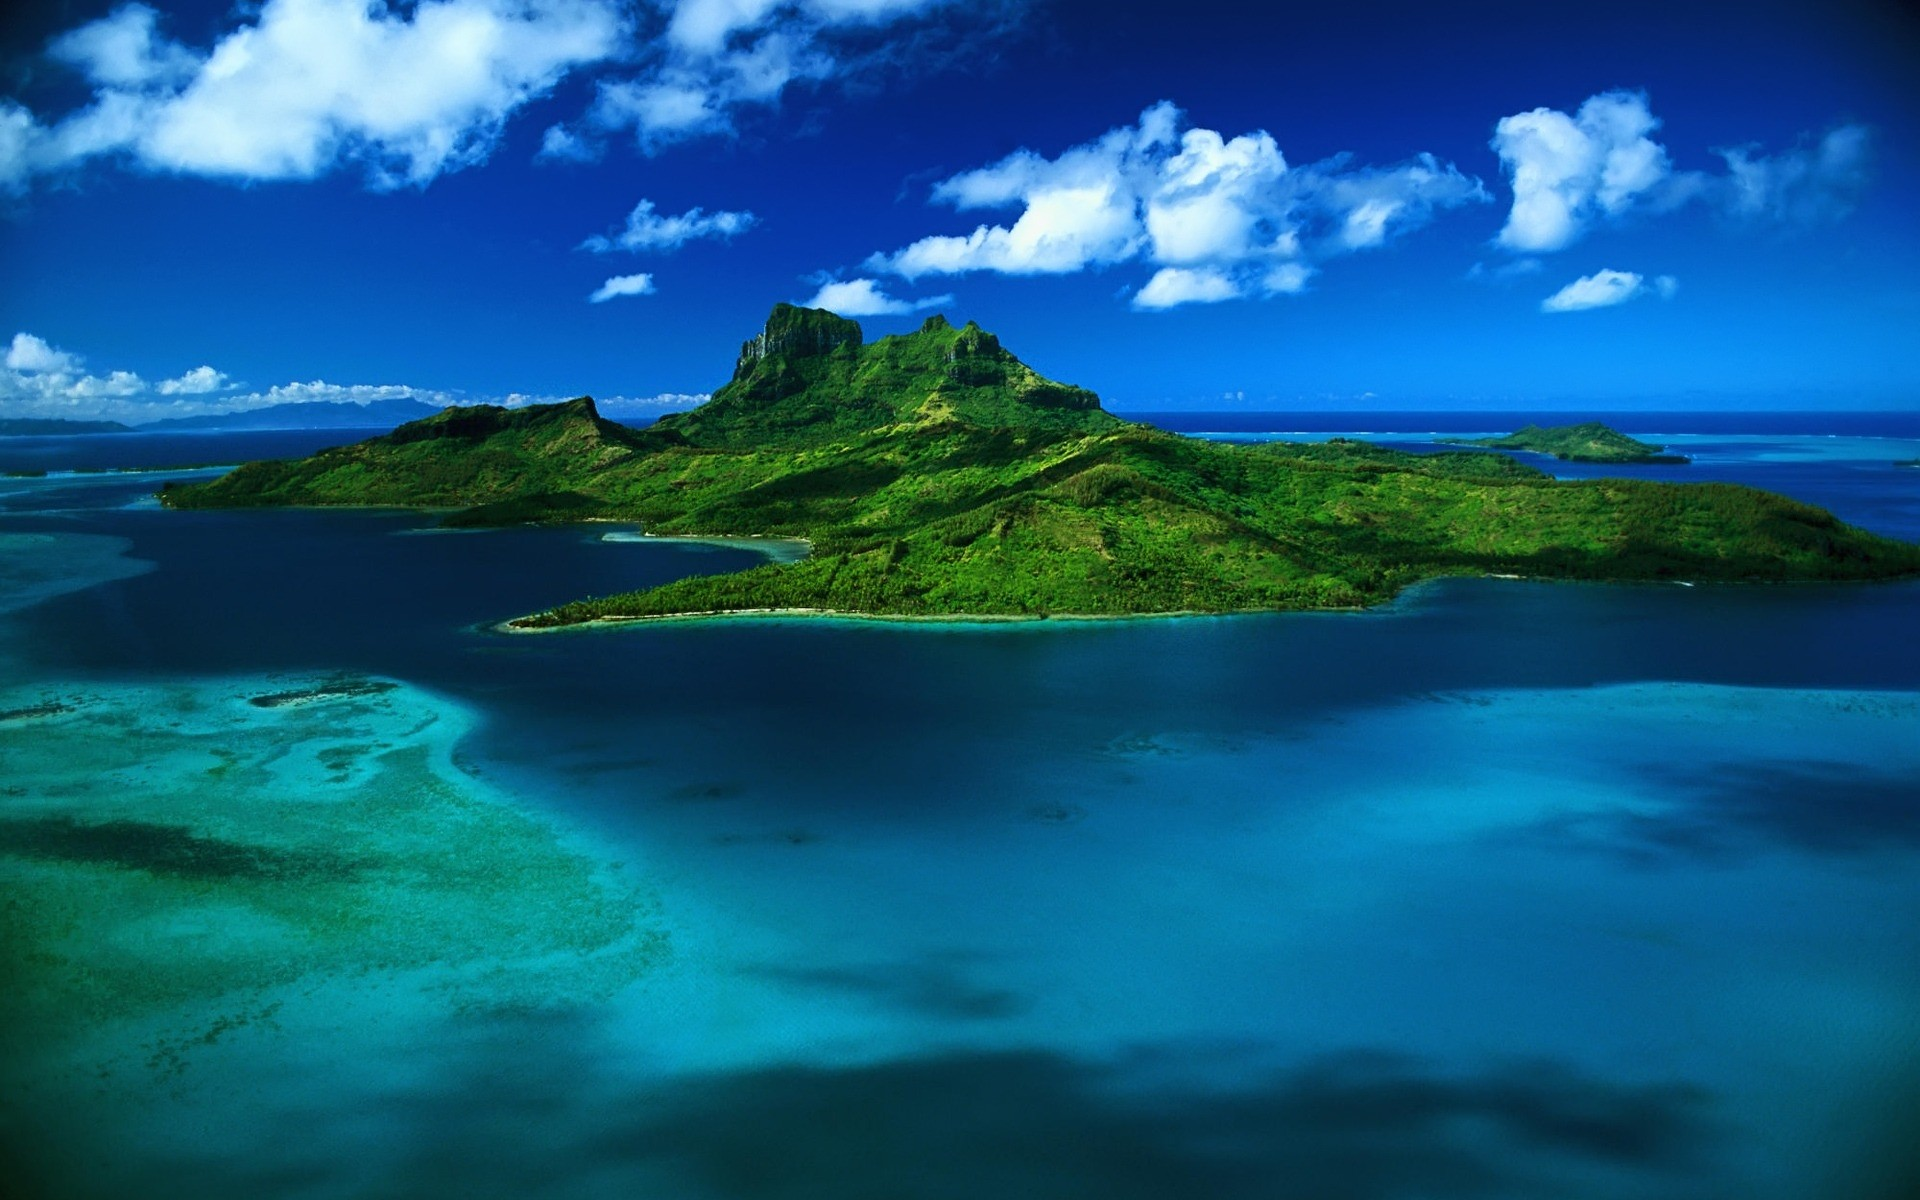 Tropical Island Desktop Backgrounds 1920x1200